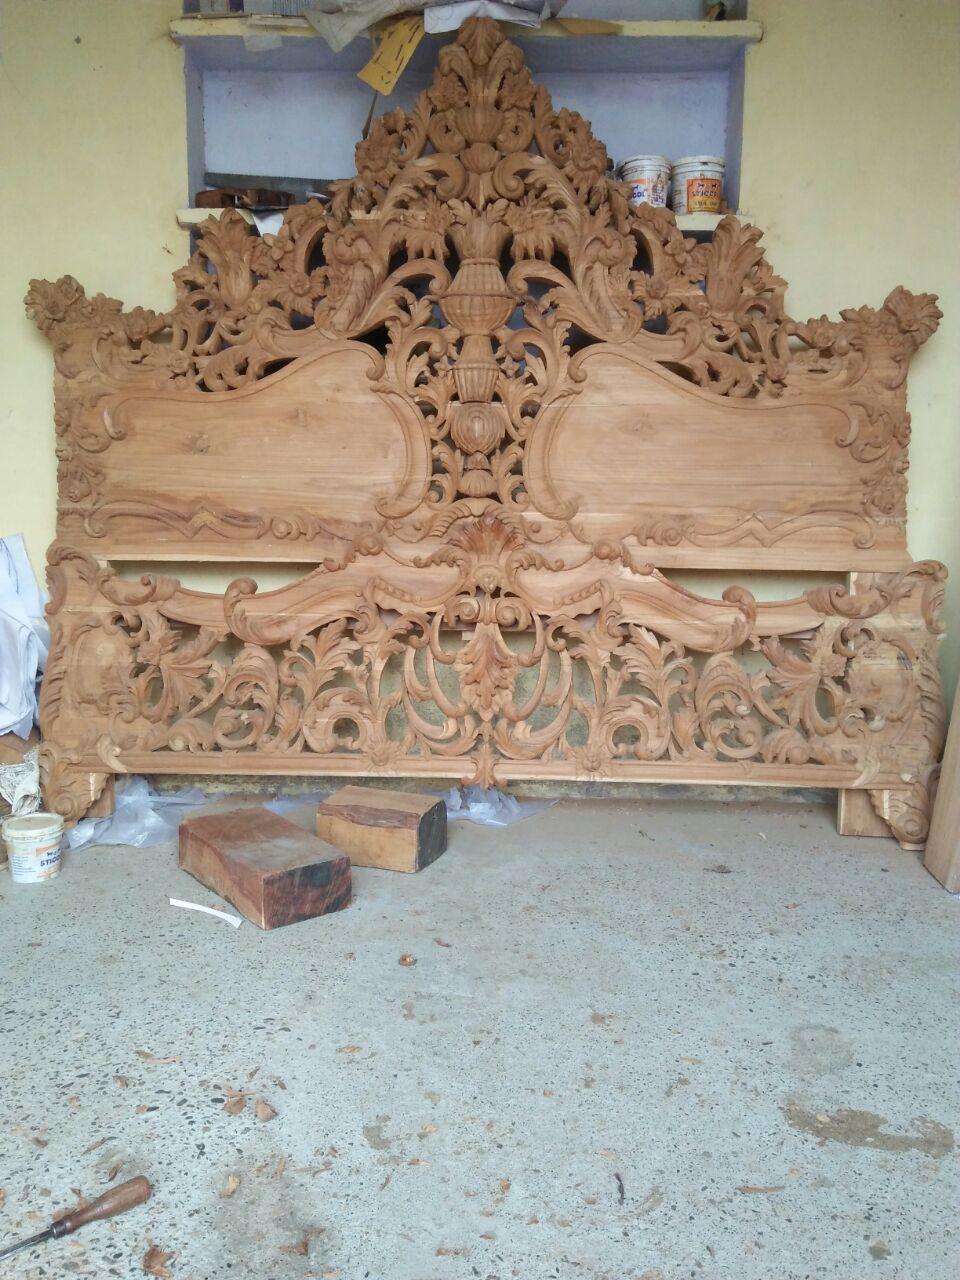 Mbk Wood Carving Works 08033016296 In Hyderabad India Wood Bed Design Door Design Wood Carved Furniture